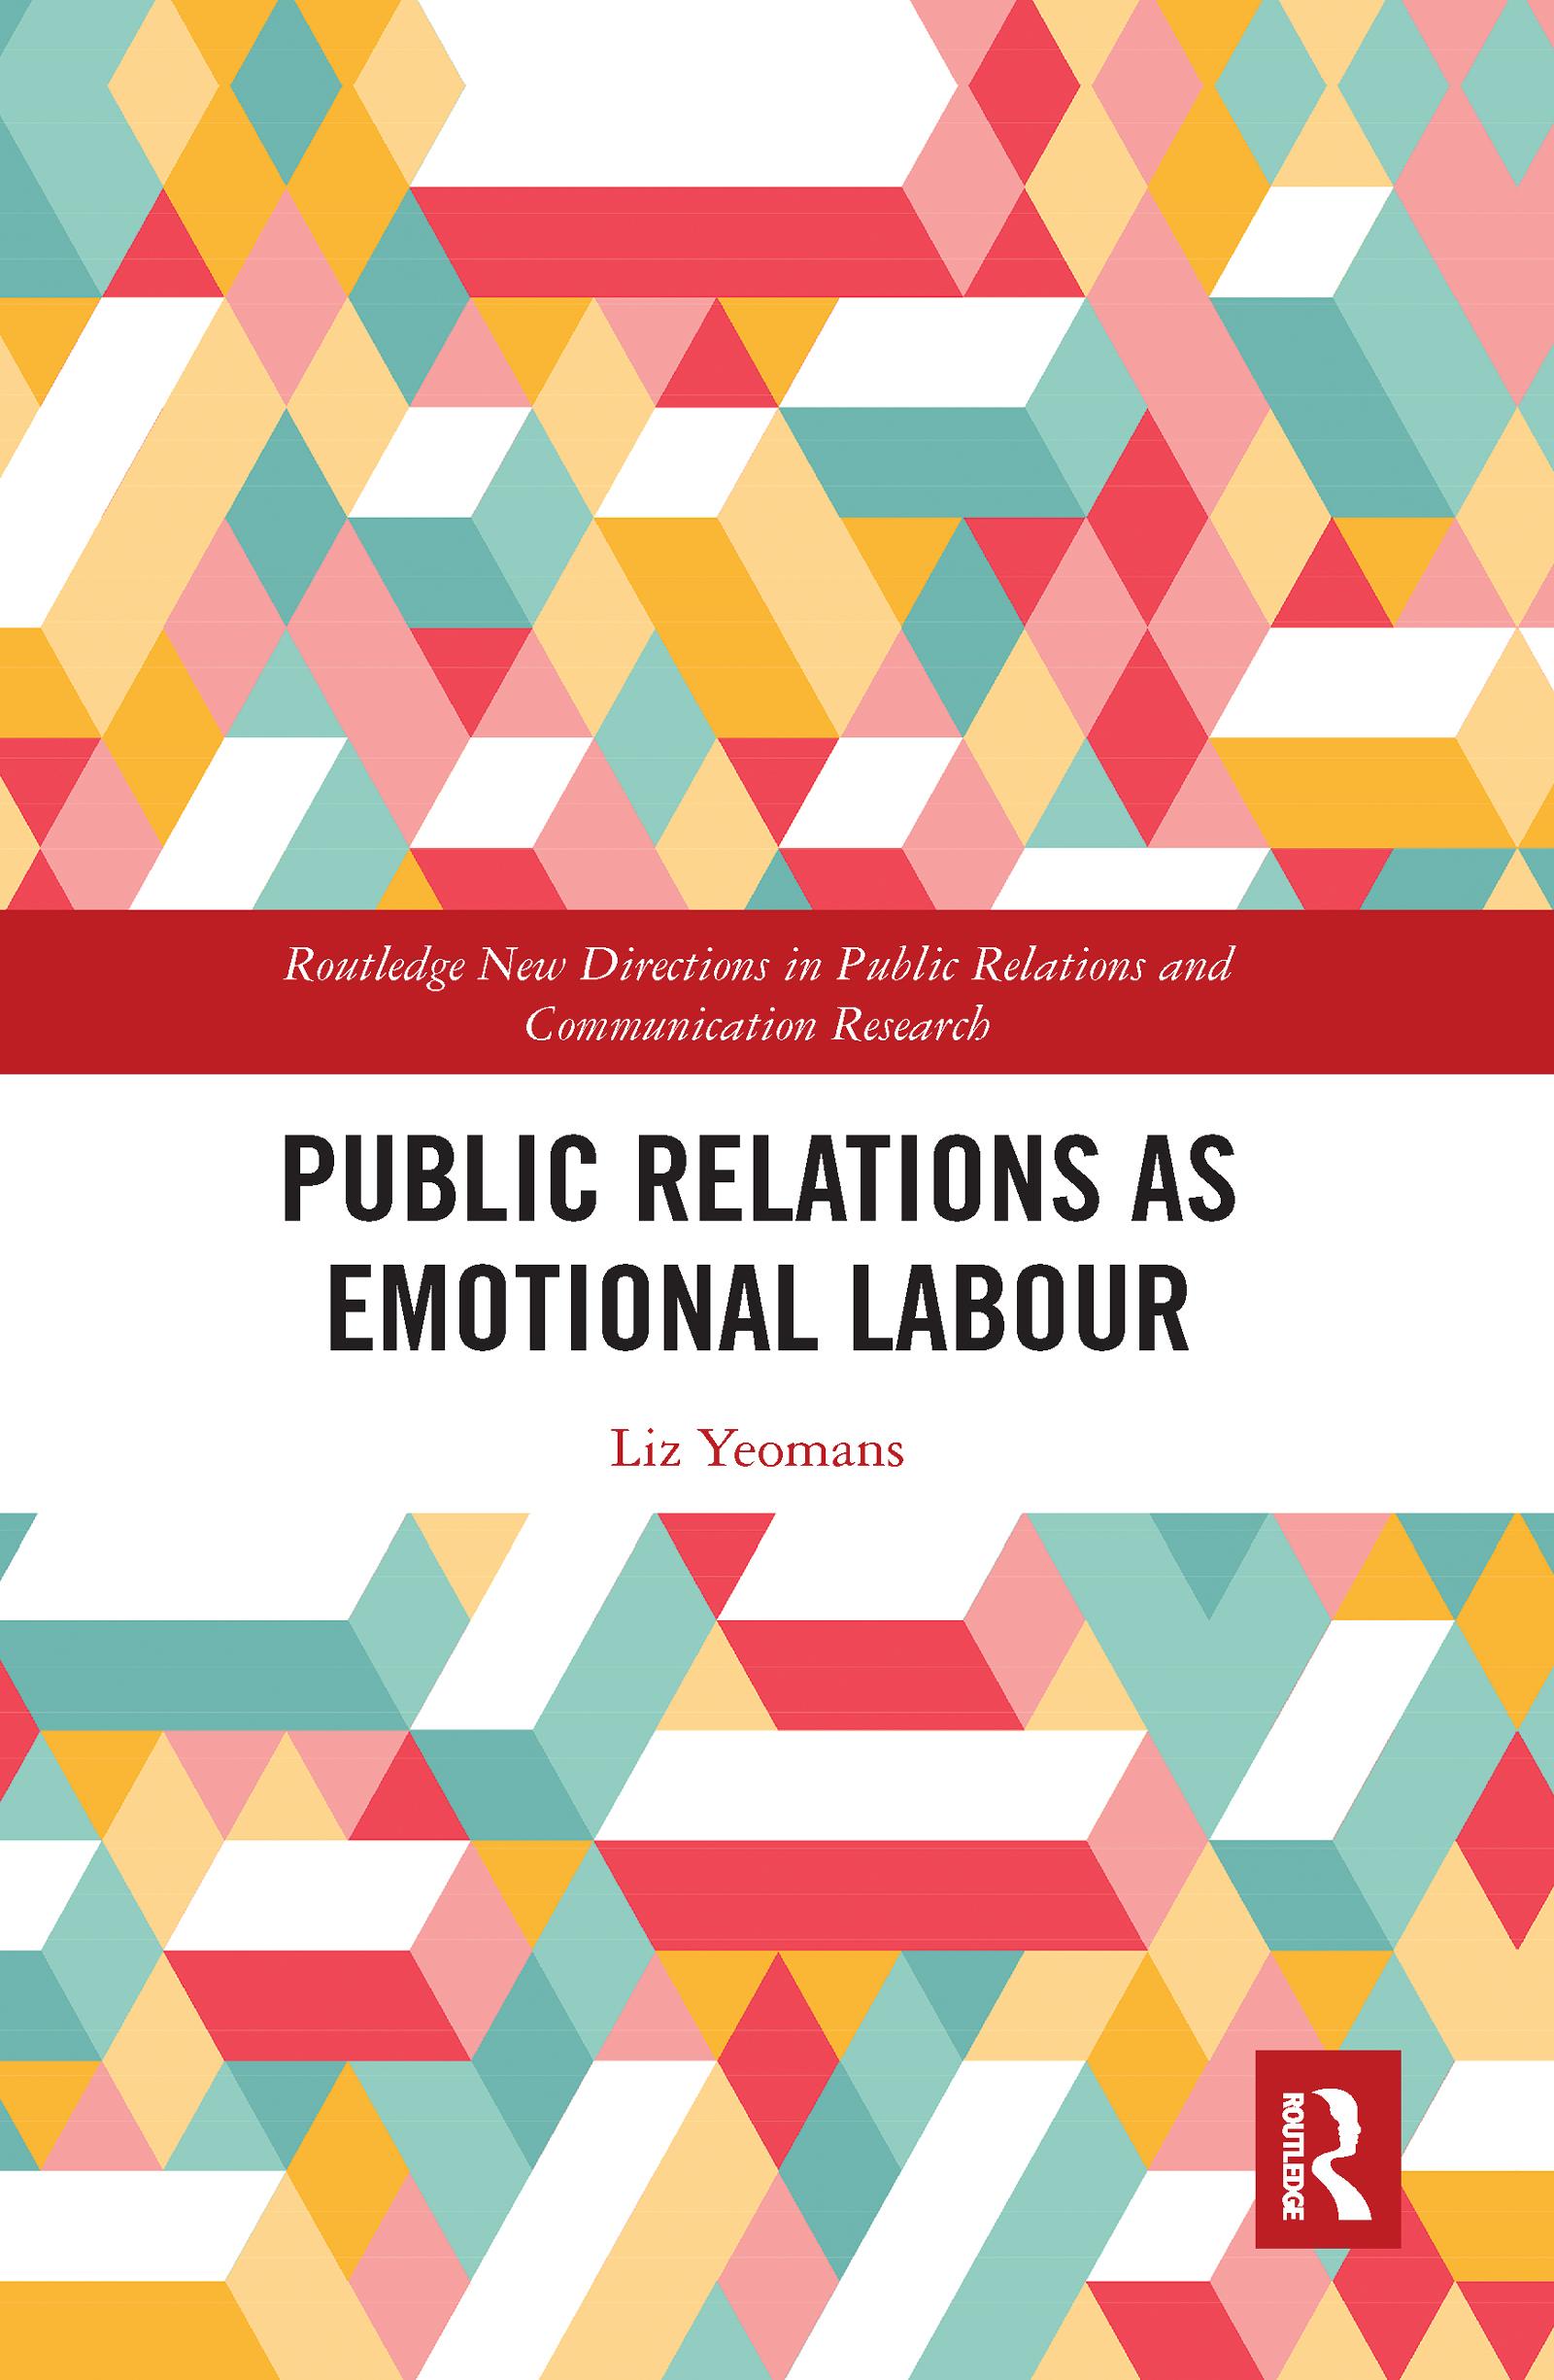 Public Relations as Emotional Labour